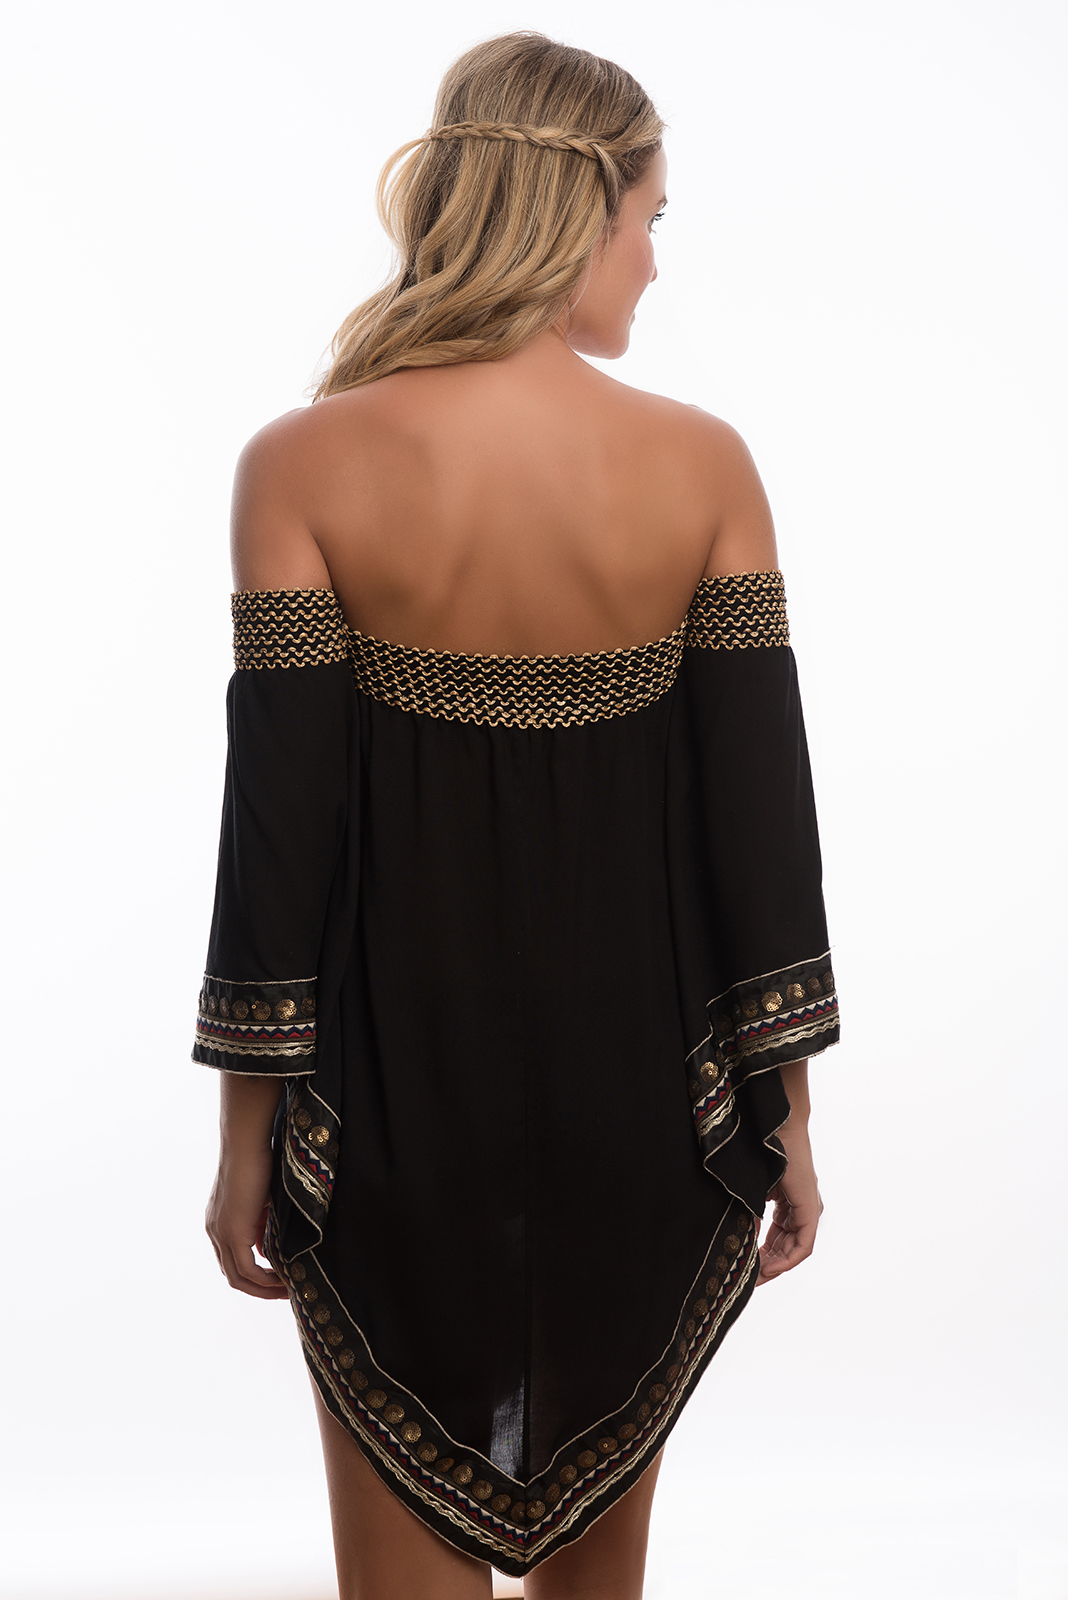 236dfcfe9b0a ... Sort broderet tunika strandkjole i orientalsk stil - CALICUTE TUNIC  BLACK ...